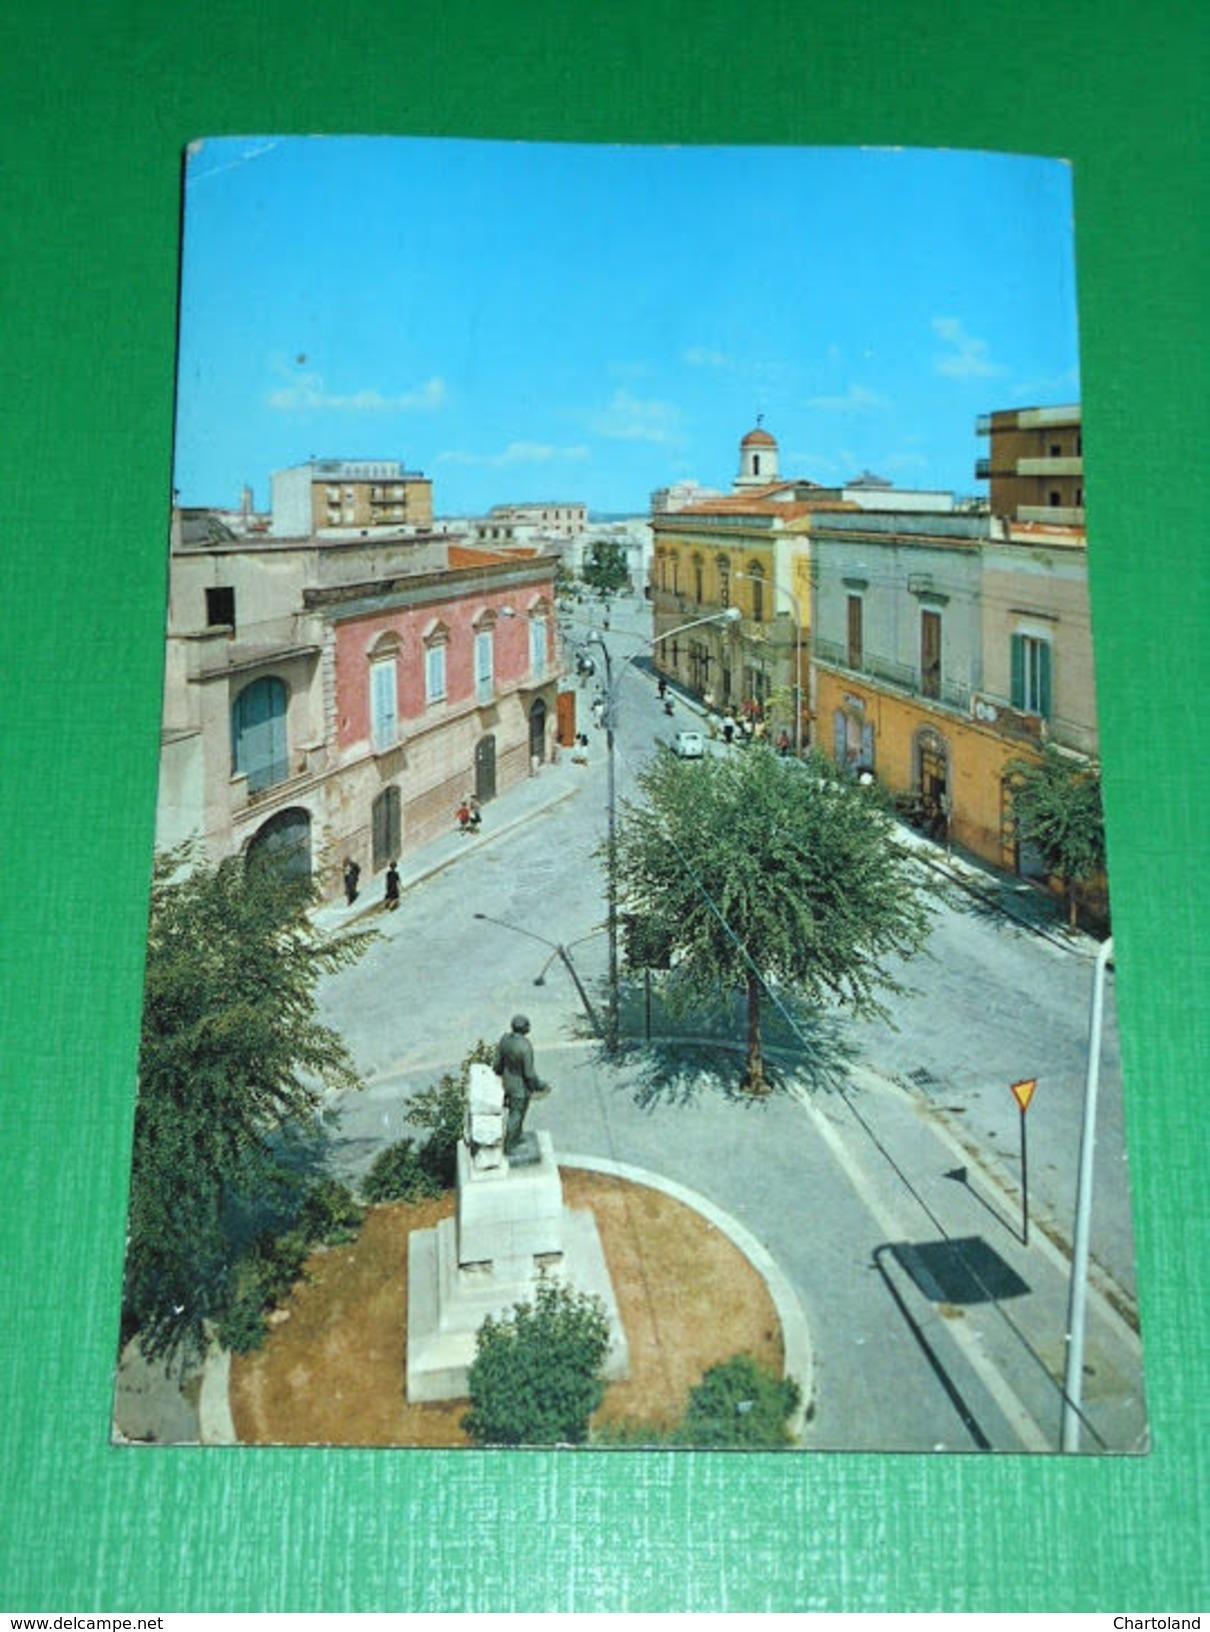 Cartolina Canosa Di Puglia - Piazza Imbriani 1972 - Bari